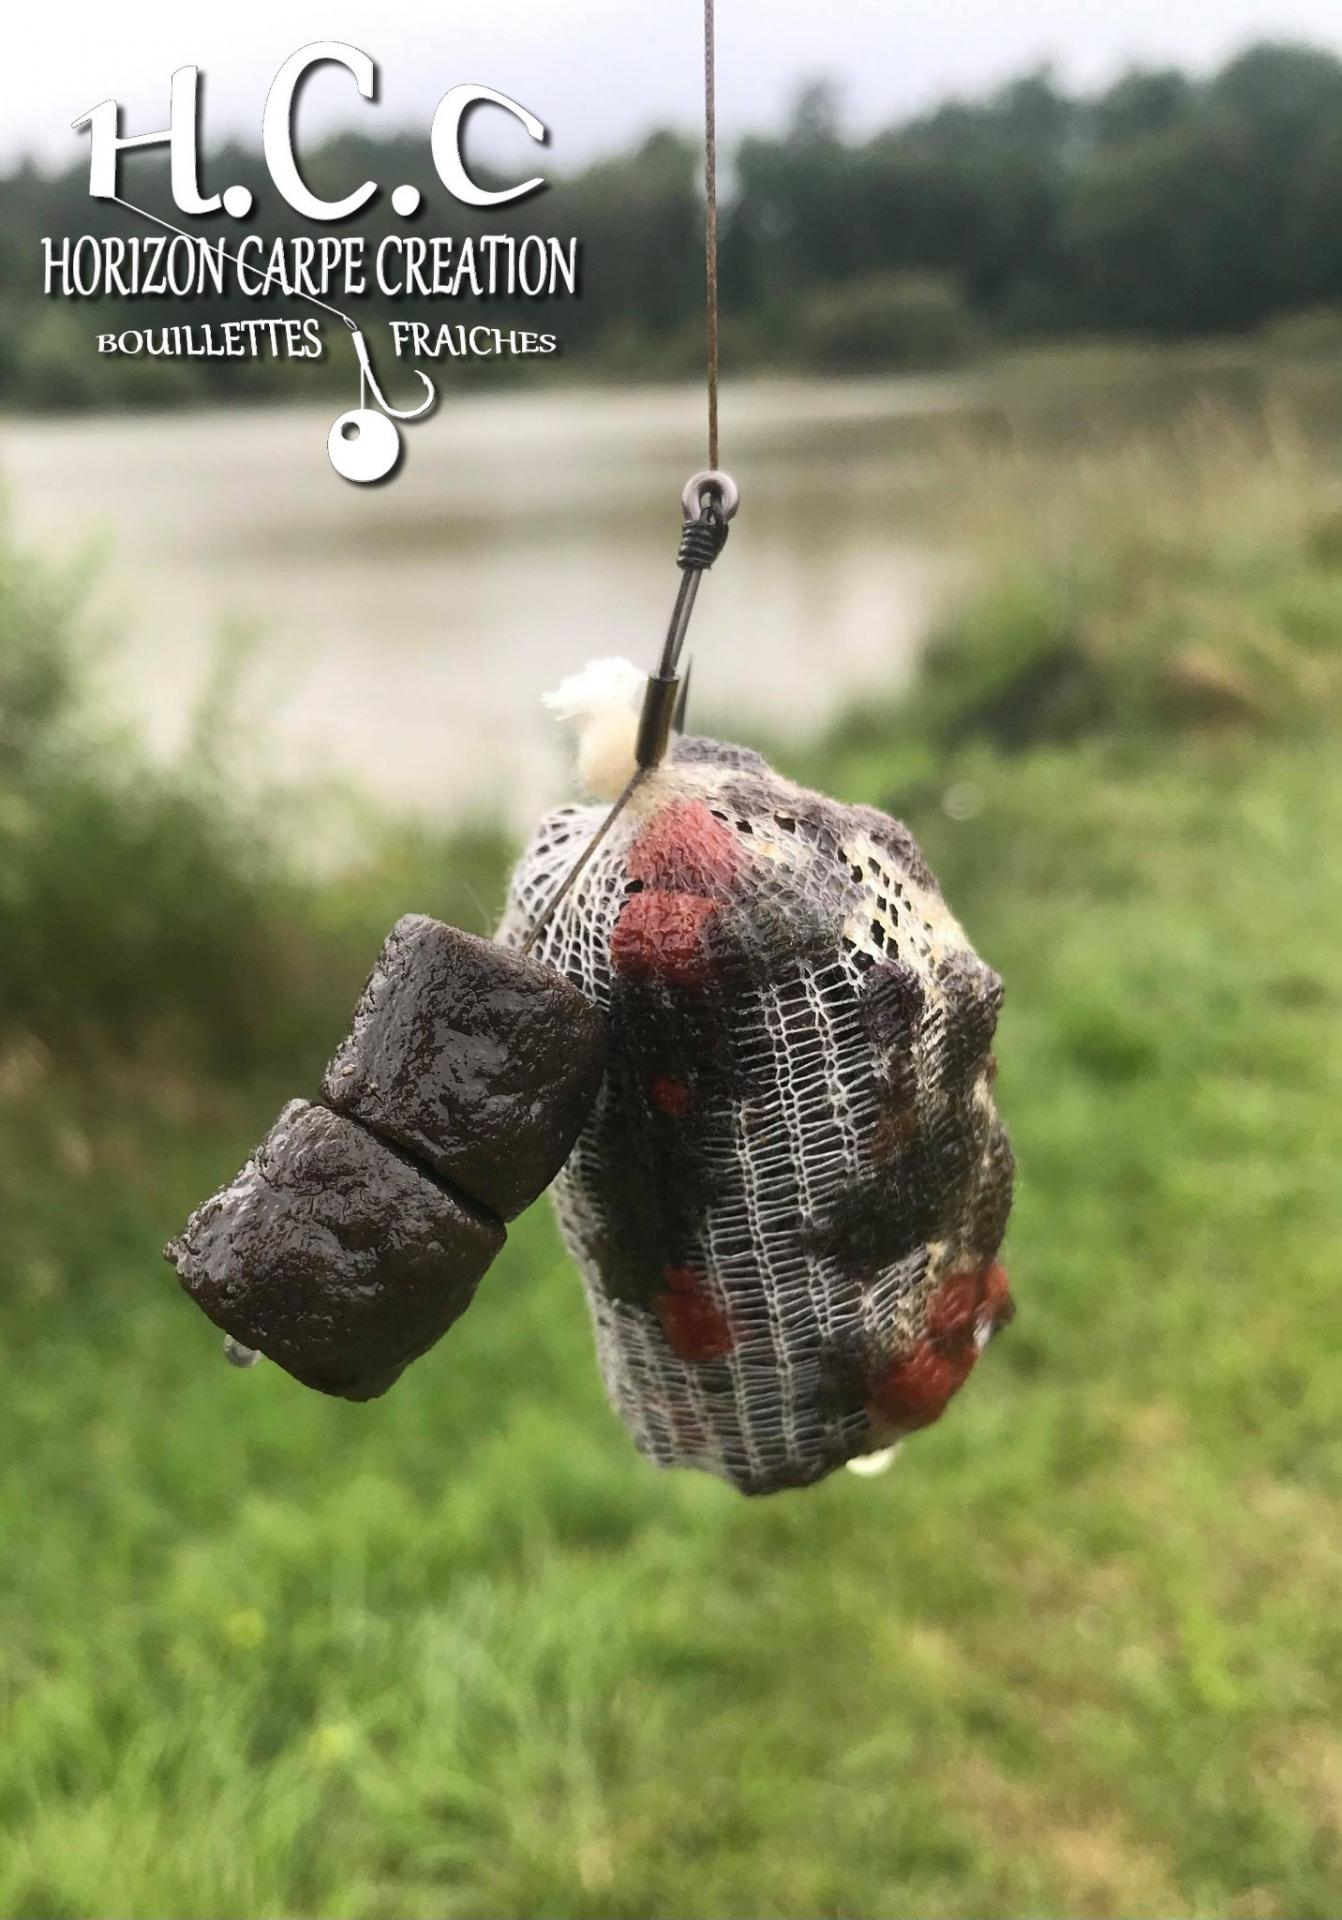 SANDRINE ARMIRAIL - TESTEUSE HCC